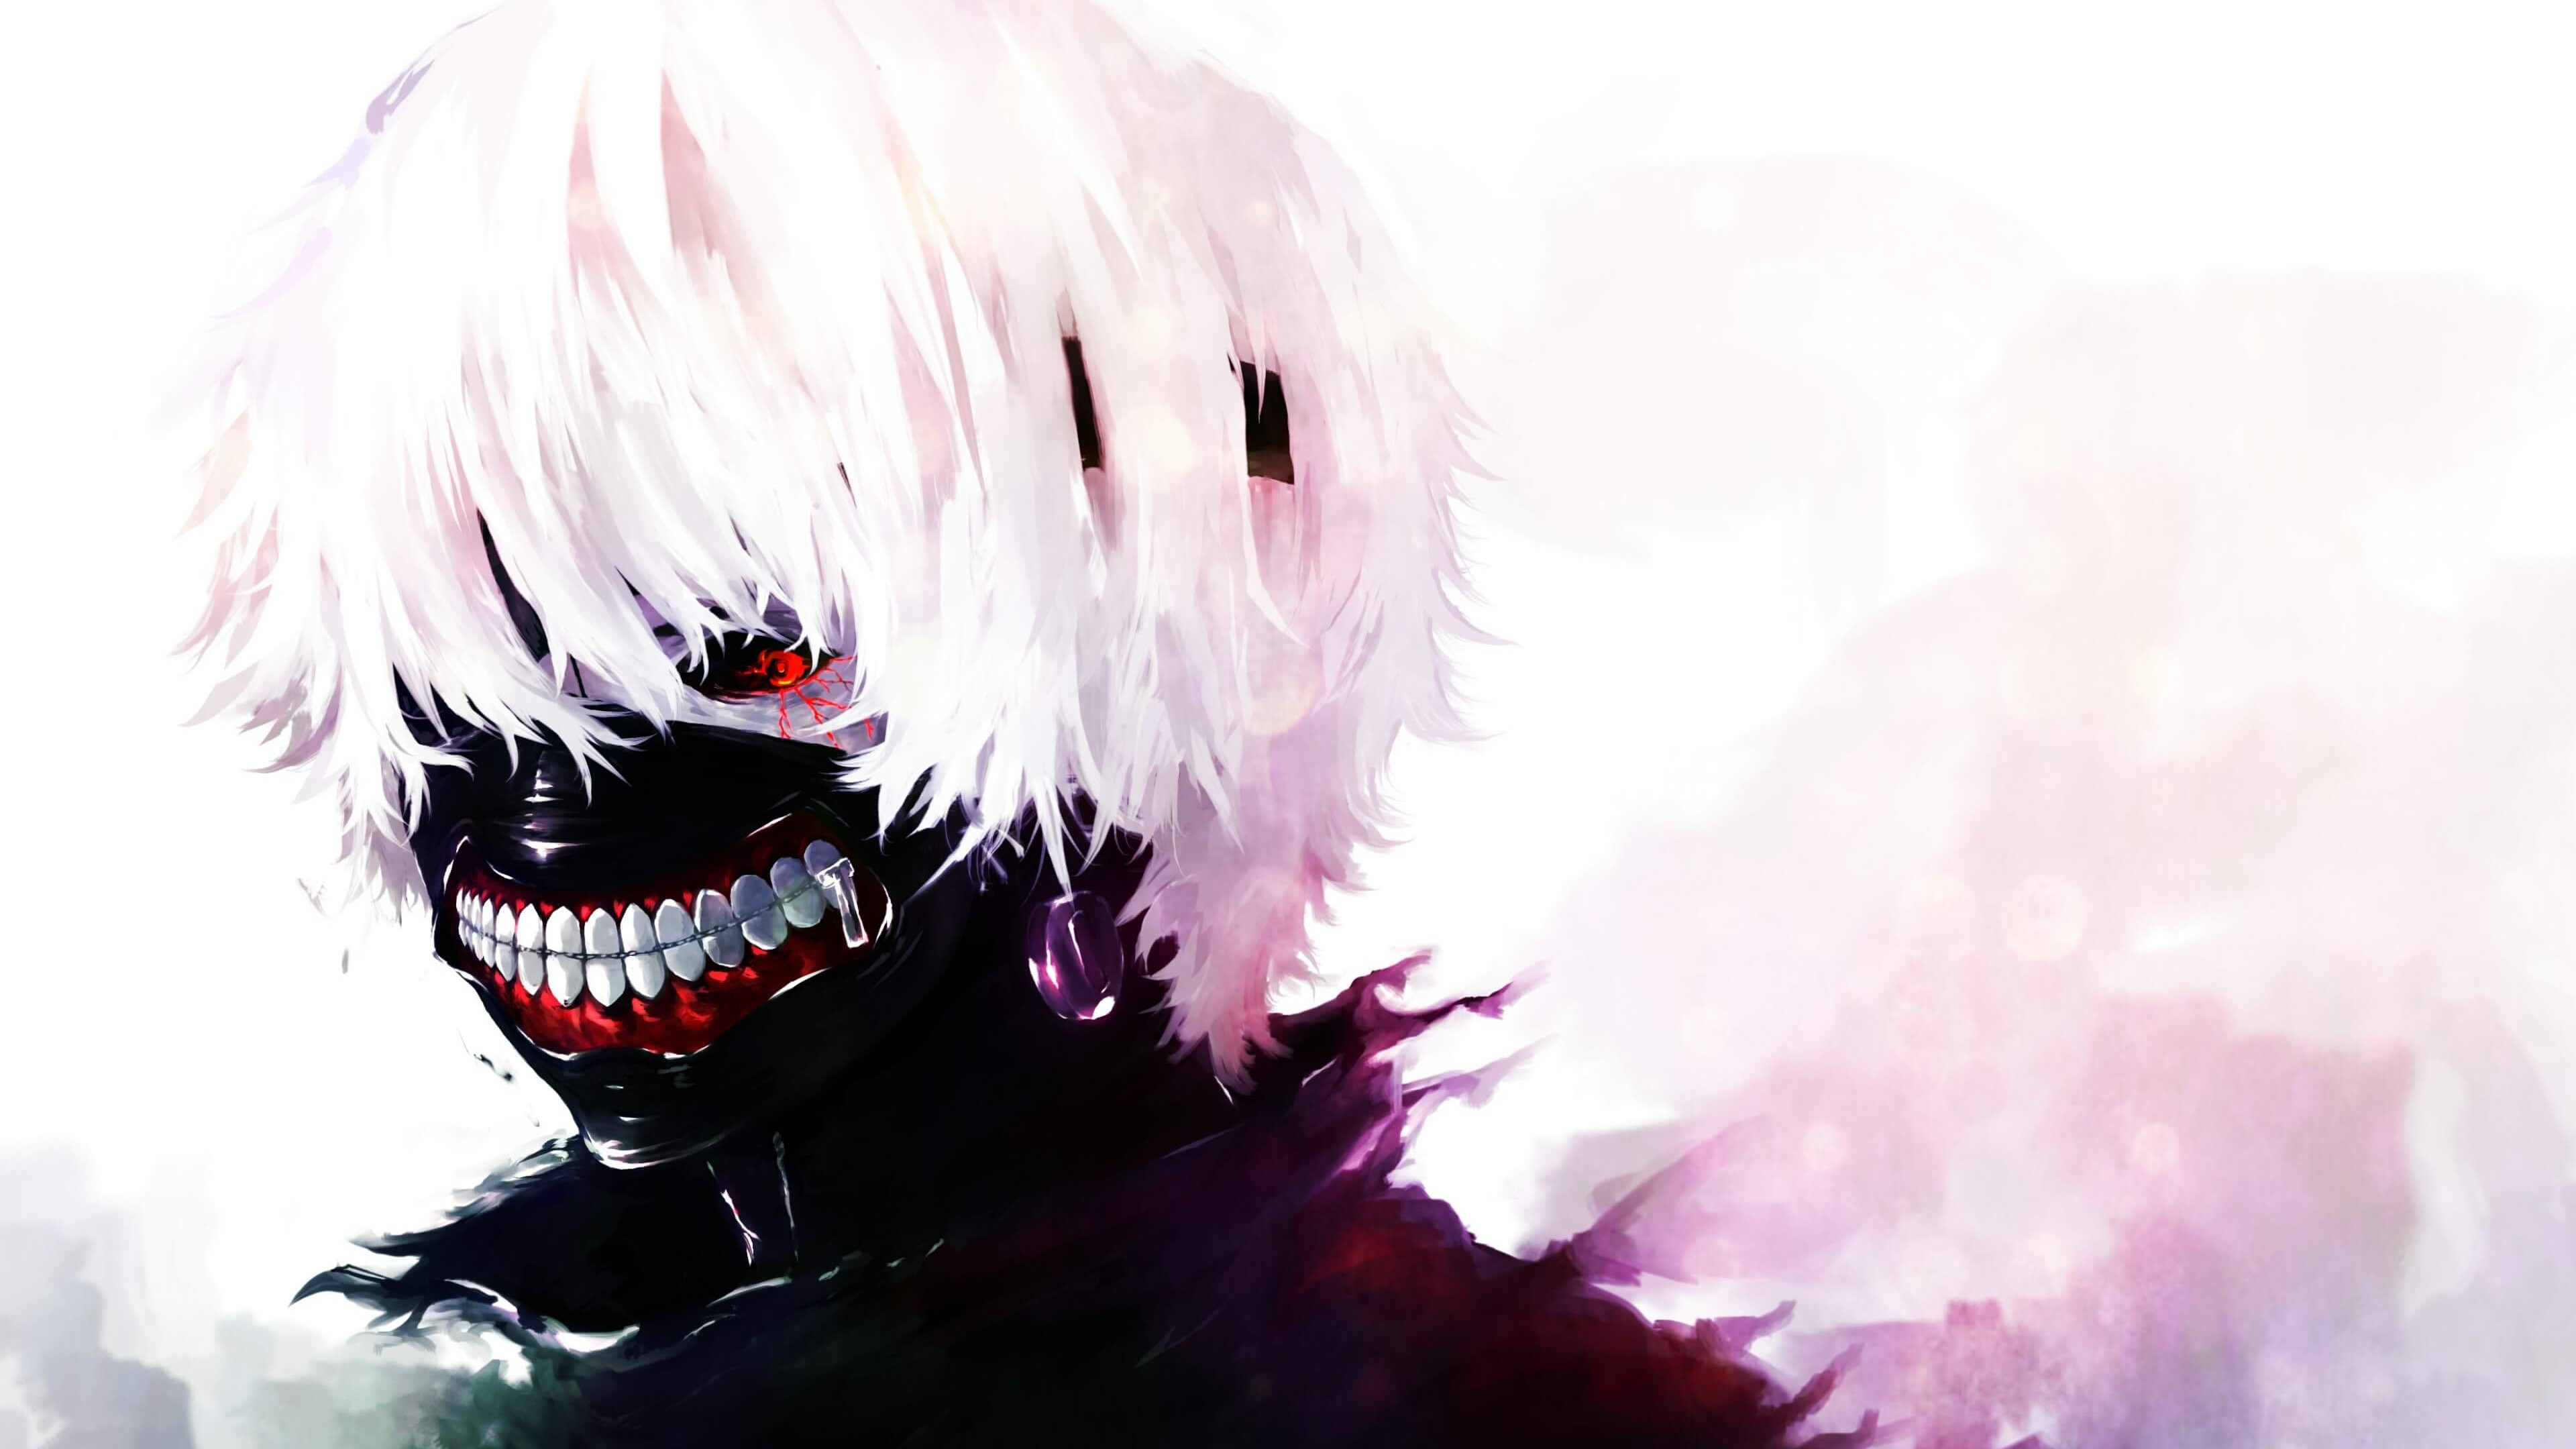 Tokyo ghoul is a japanese manga series of dark fantasy genre. Ken Kaneki - Tokyo Ghoul 4K wallpaper